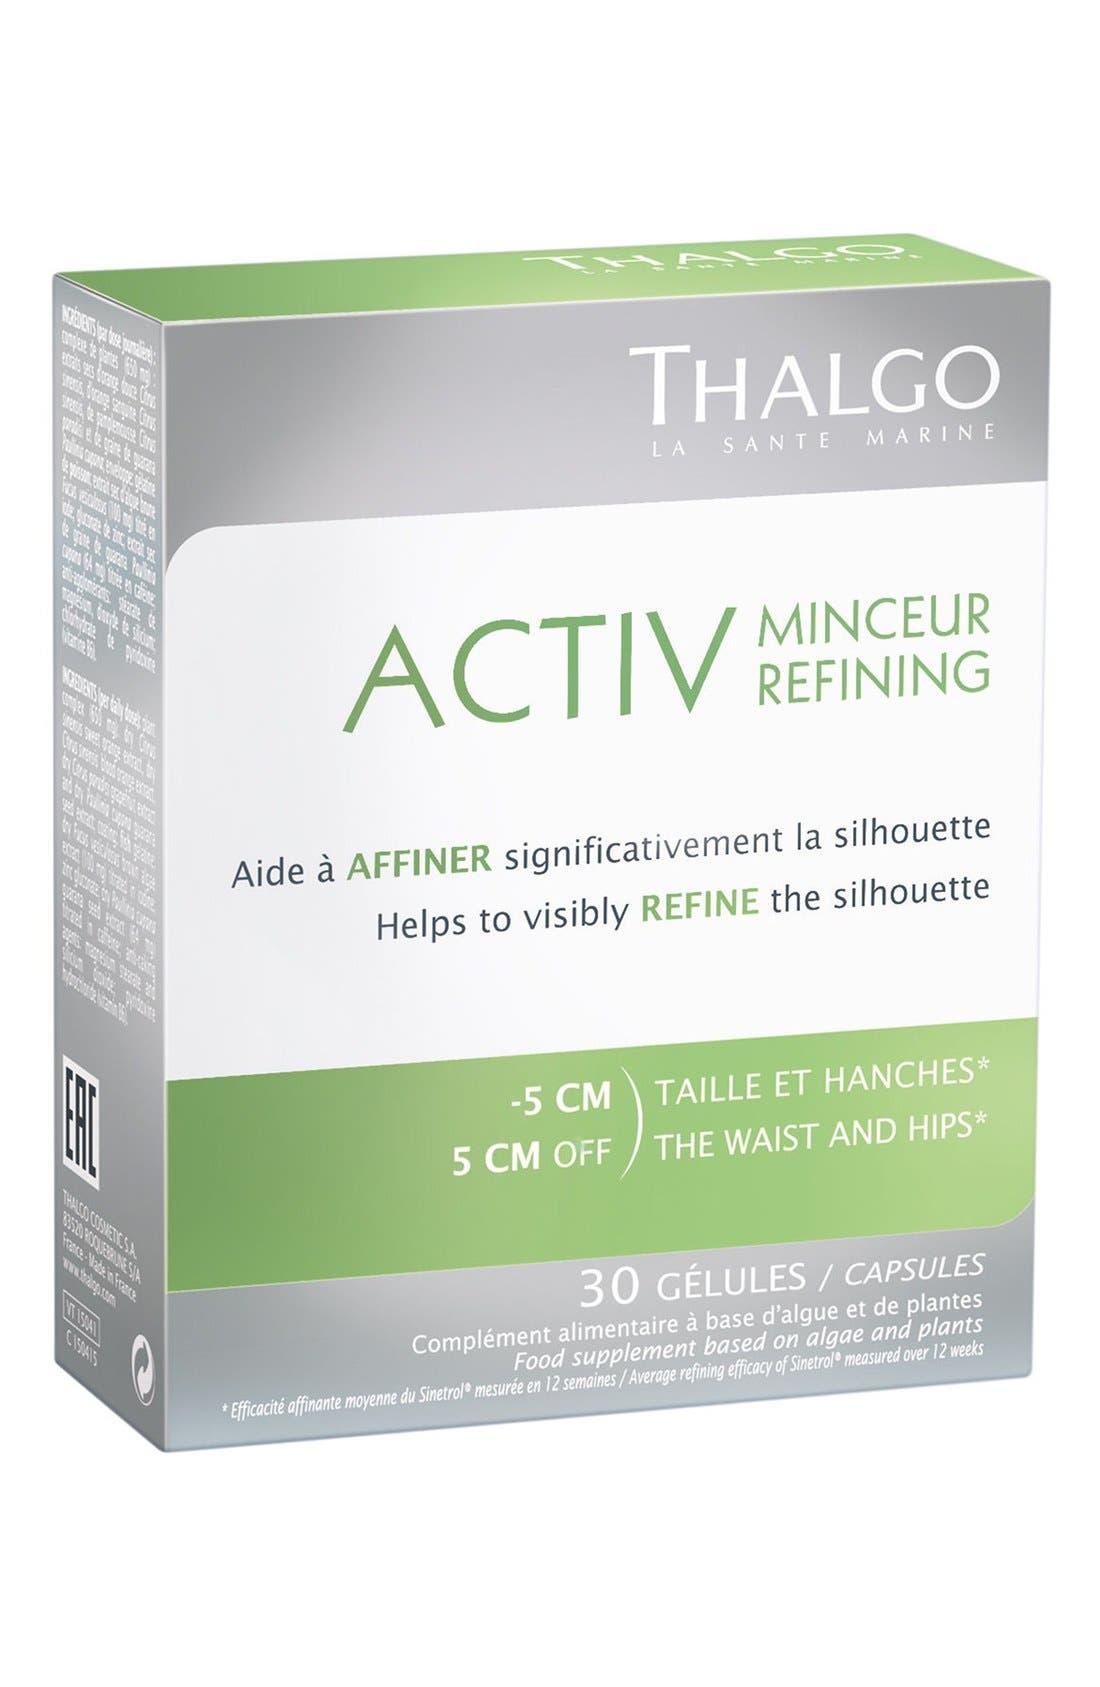 THALGO 'ACTIV' Refining Food Supplement Capsules